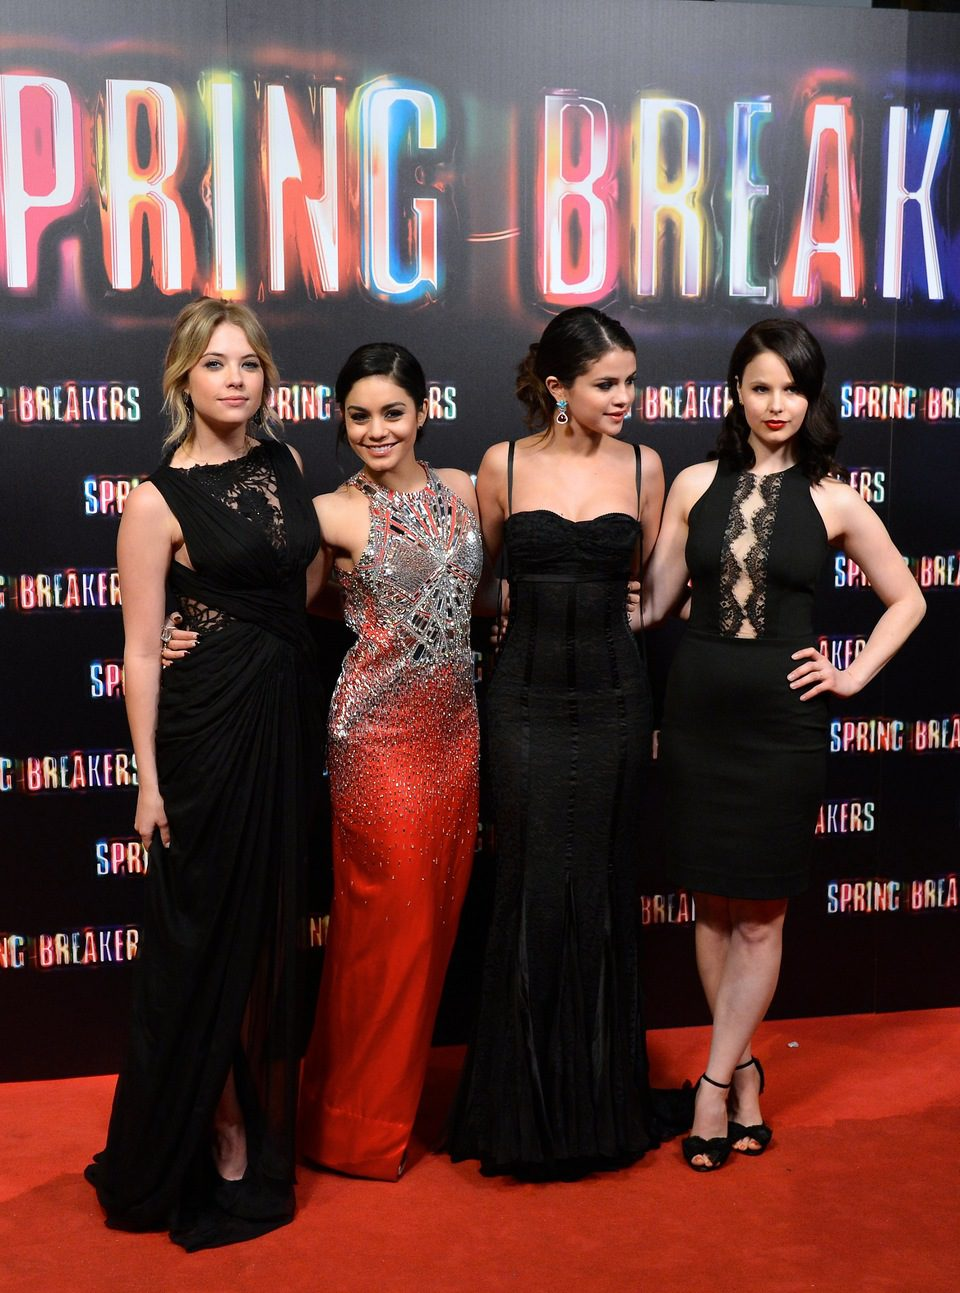 Ashley Benson, Vanessa Hudgens, Selena Gomez y Rachel Korine en la premiere de 'Spring Breakers' en Madrid